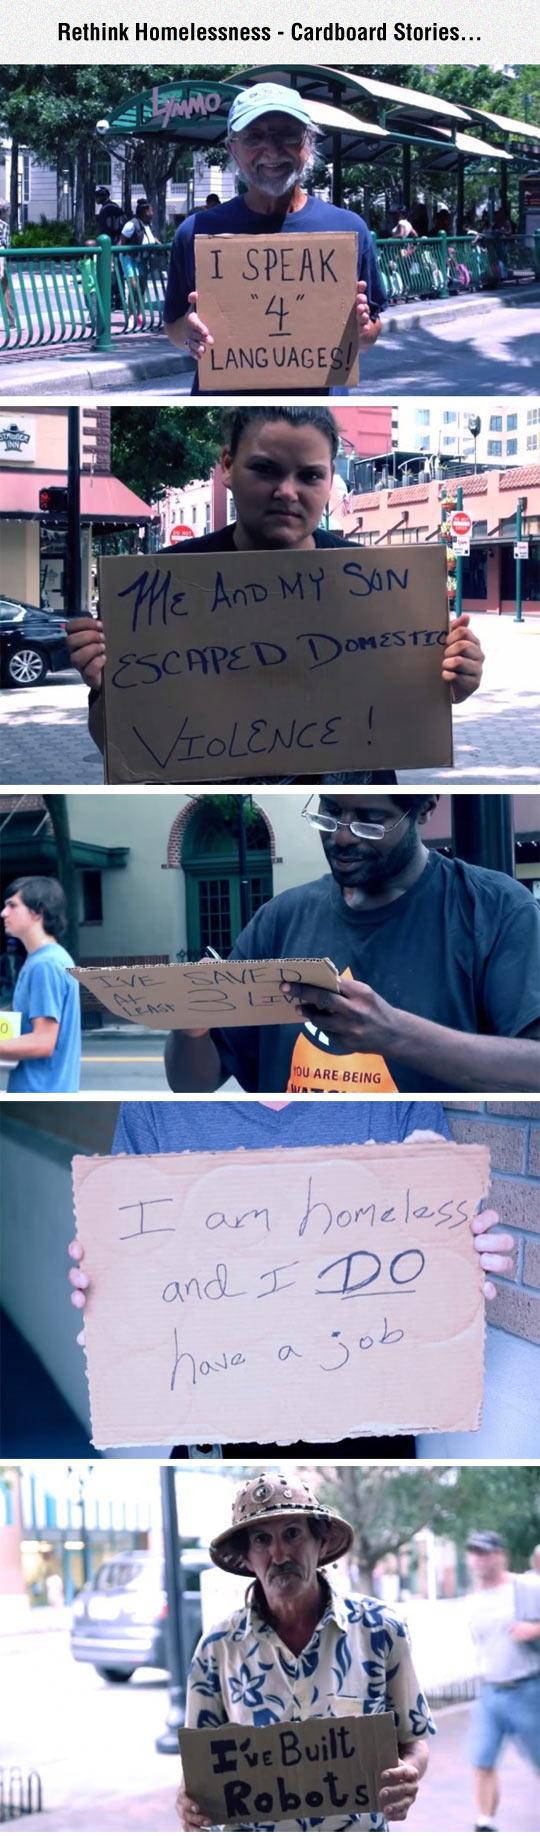 funny-homeless-cardboard-stories-street